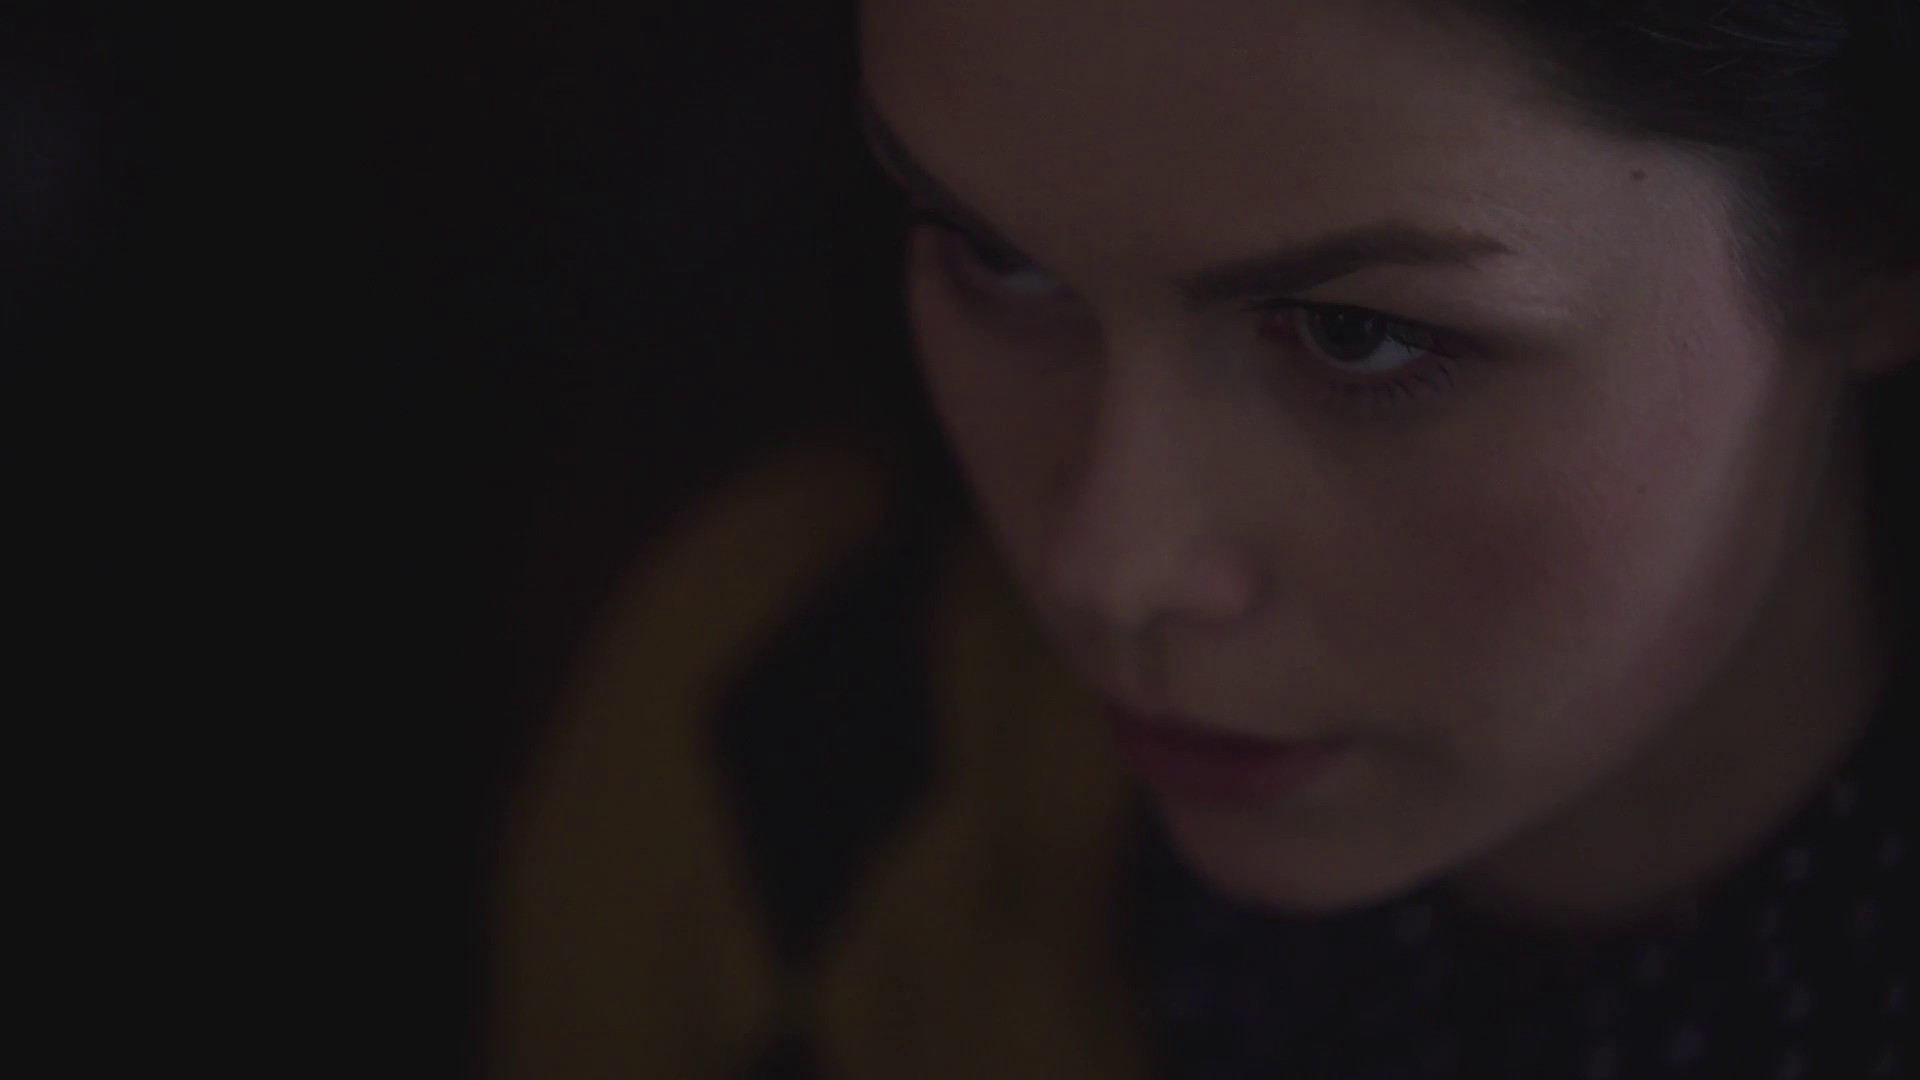 The Man Hidden in the Room - a film by Petr Makaj